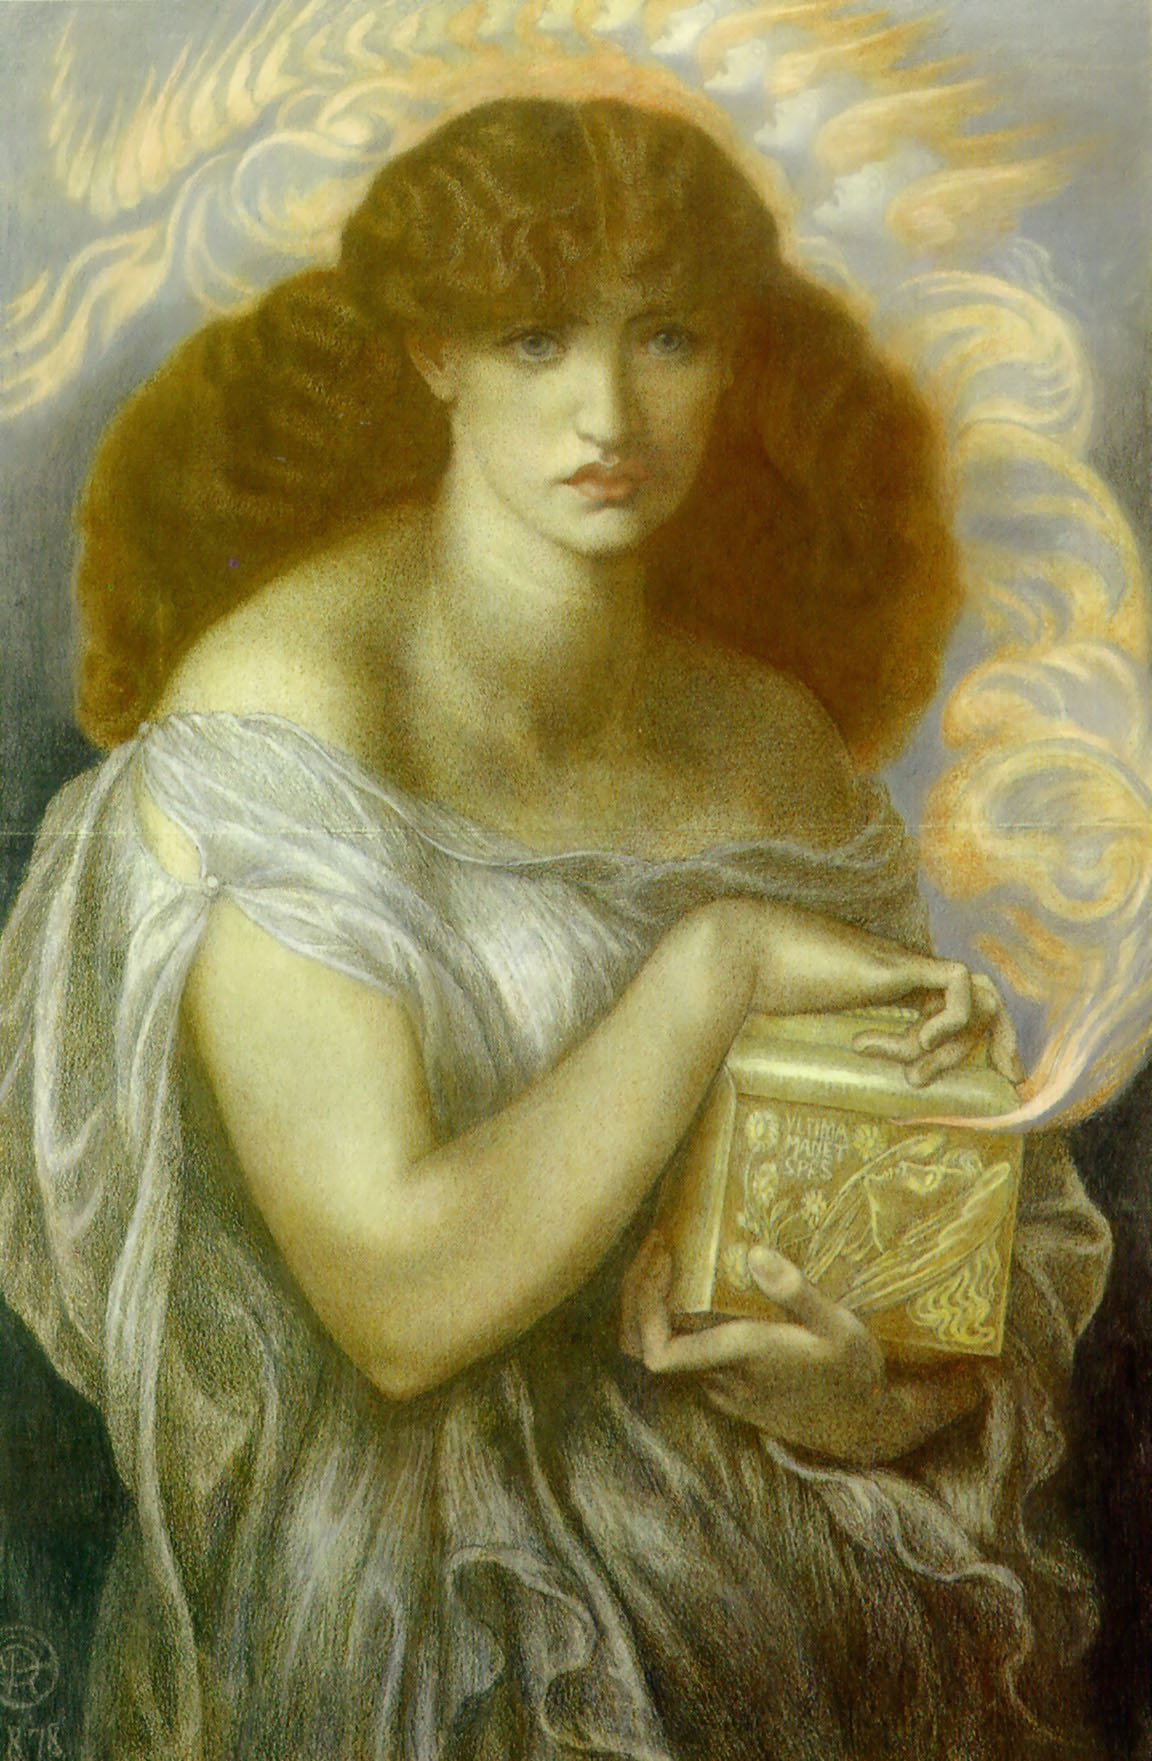 Pandora by Rossetti